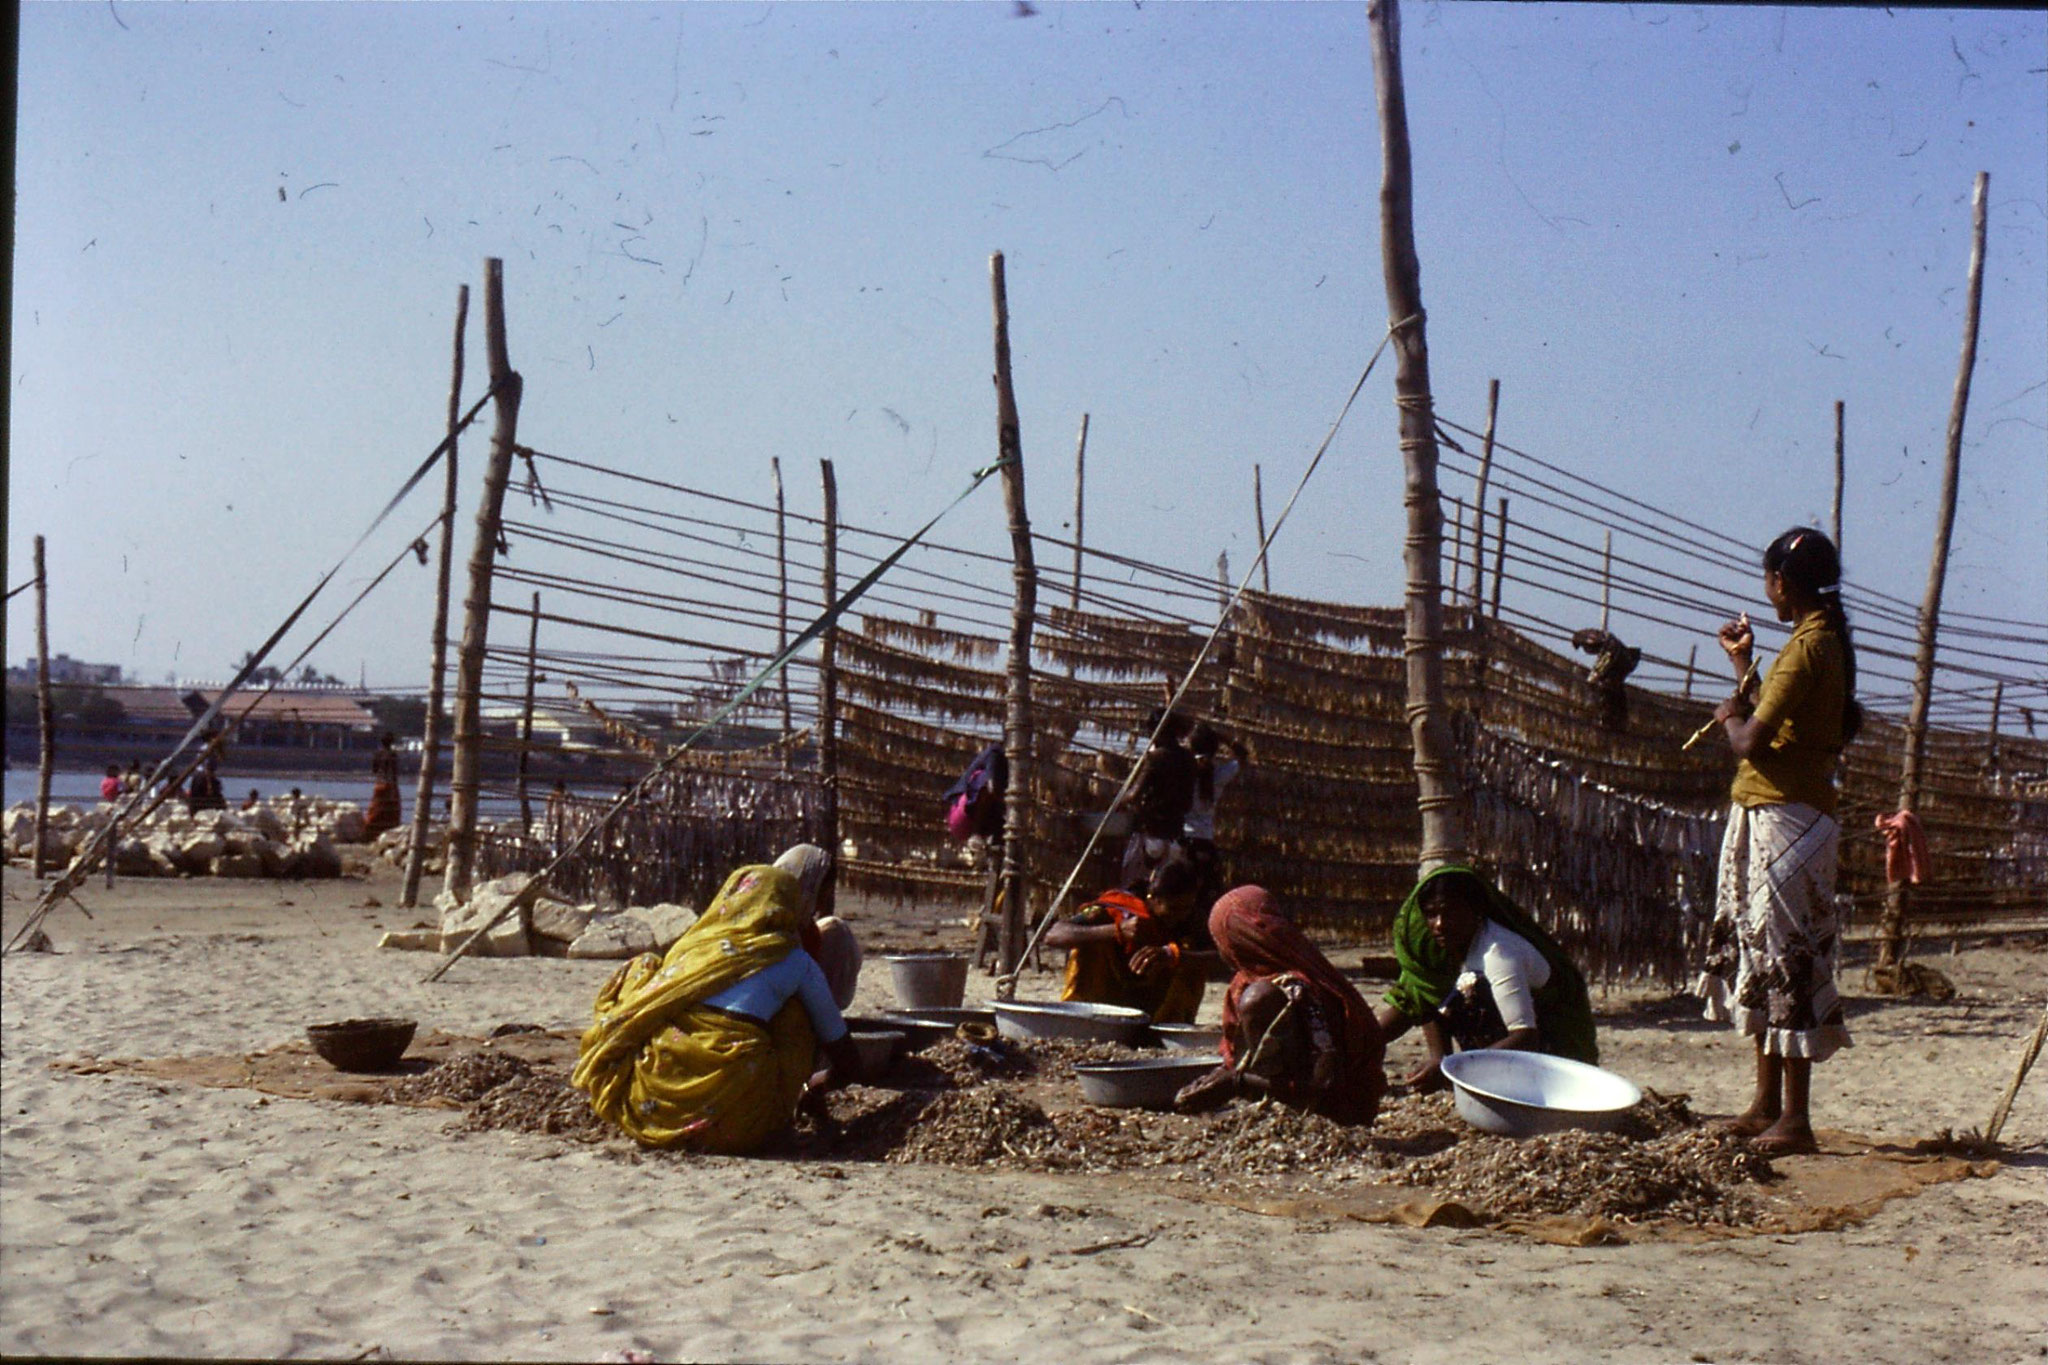 16/12/1989: 8: Diu Goghla fisherwomen